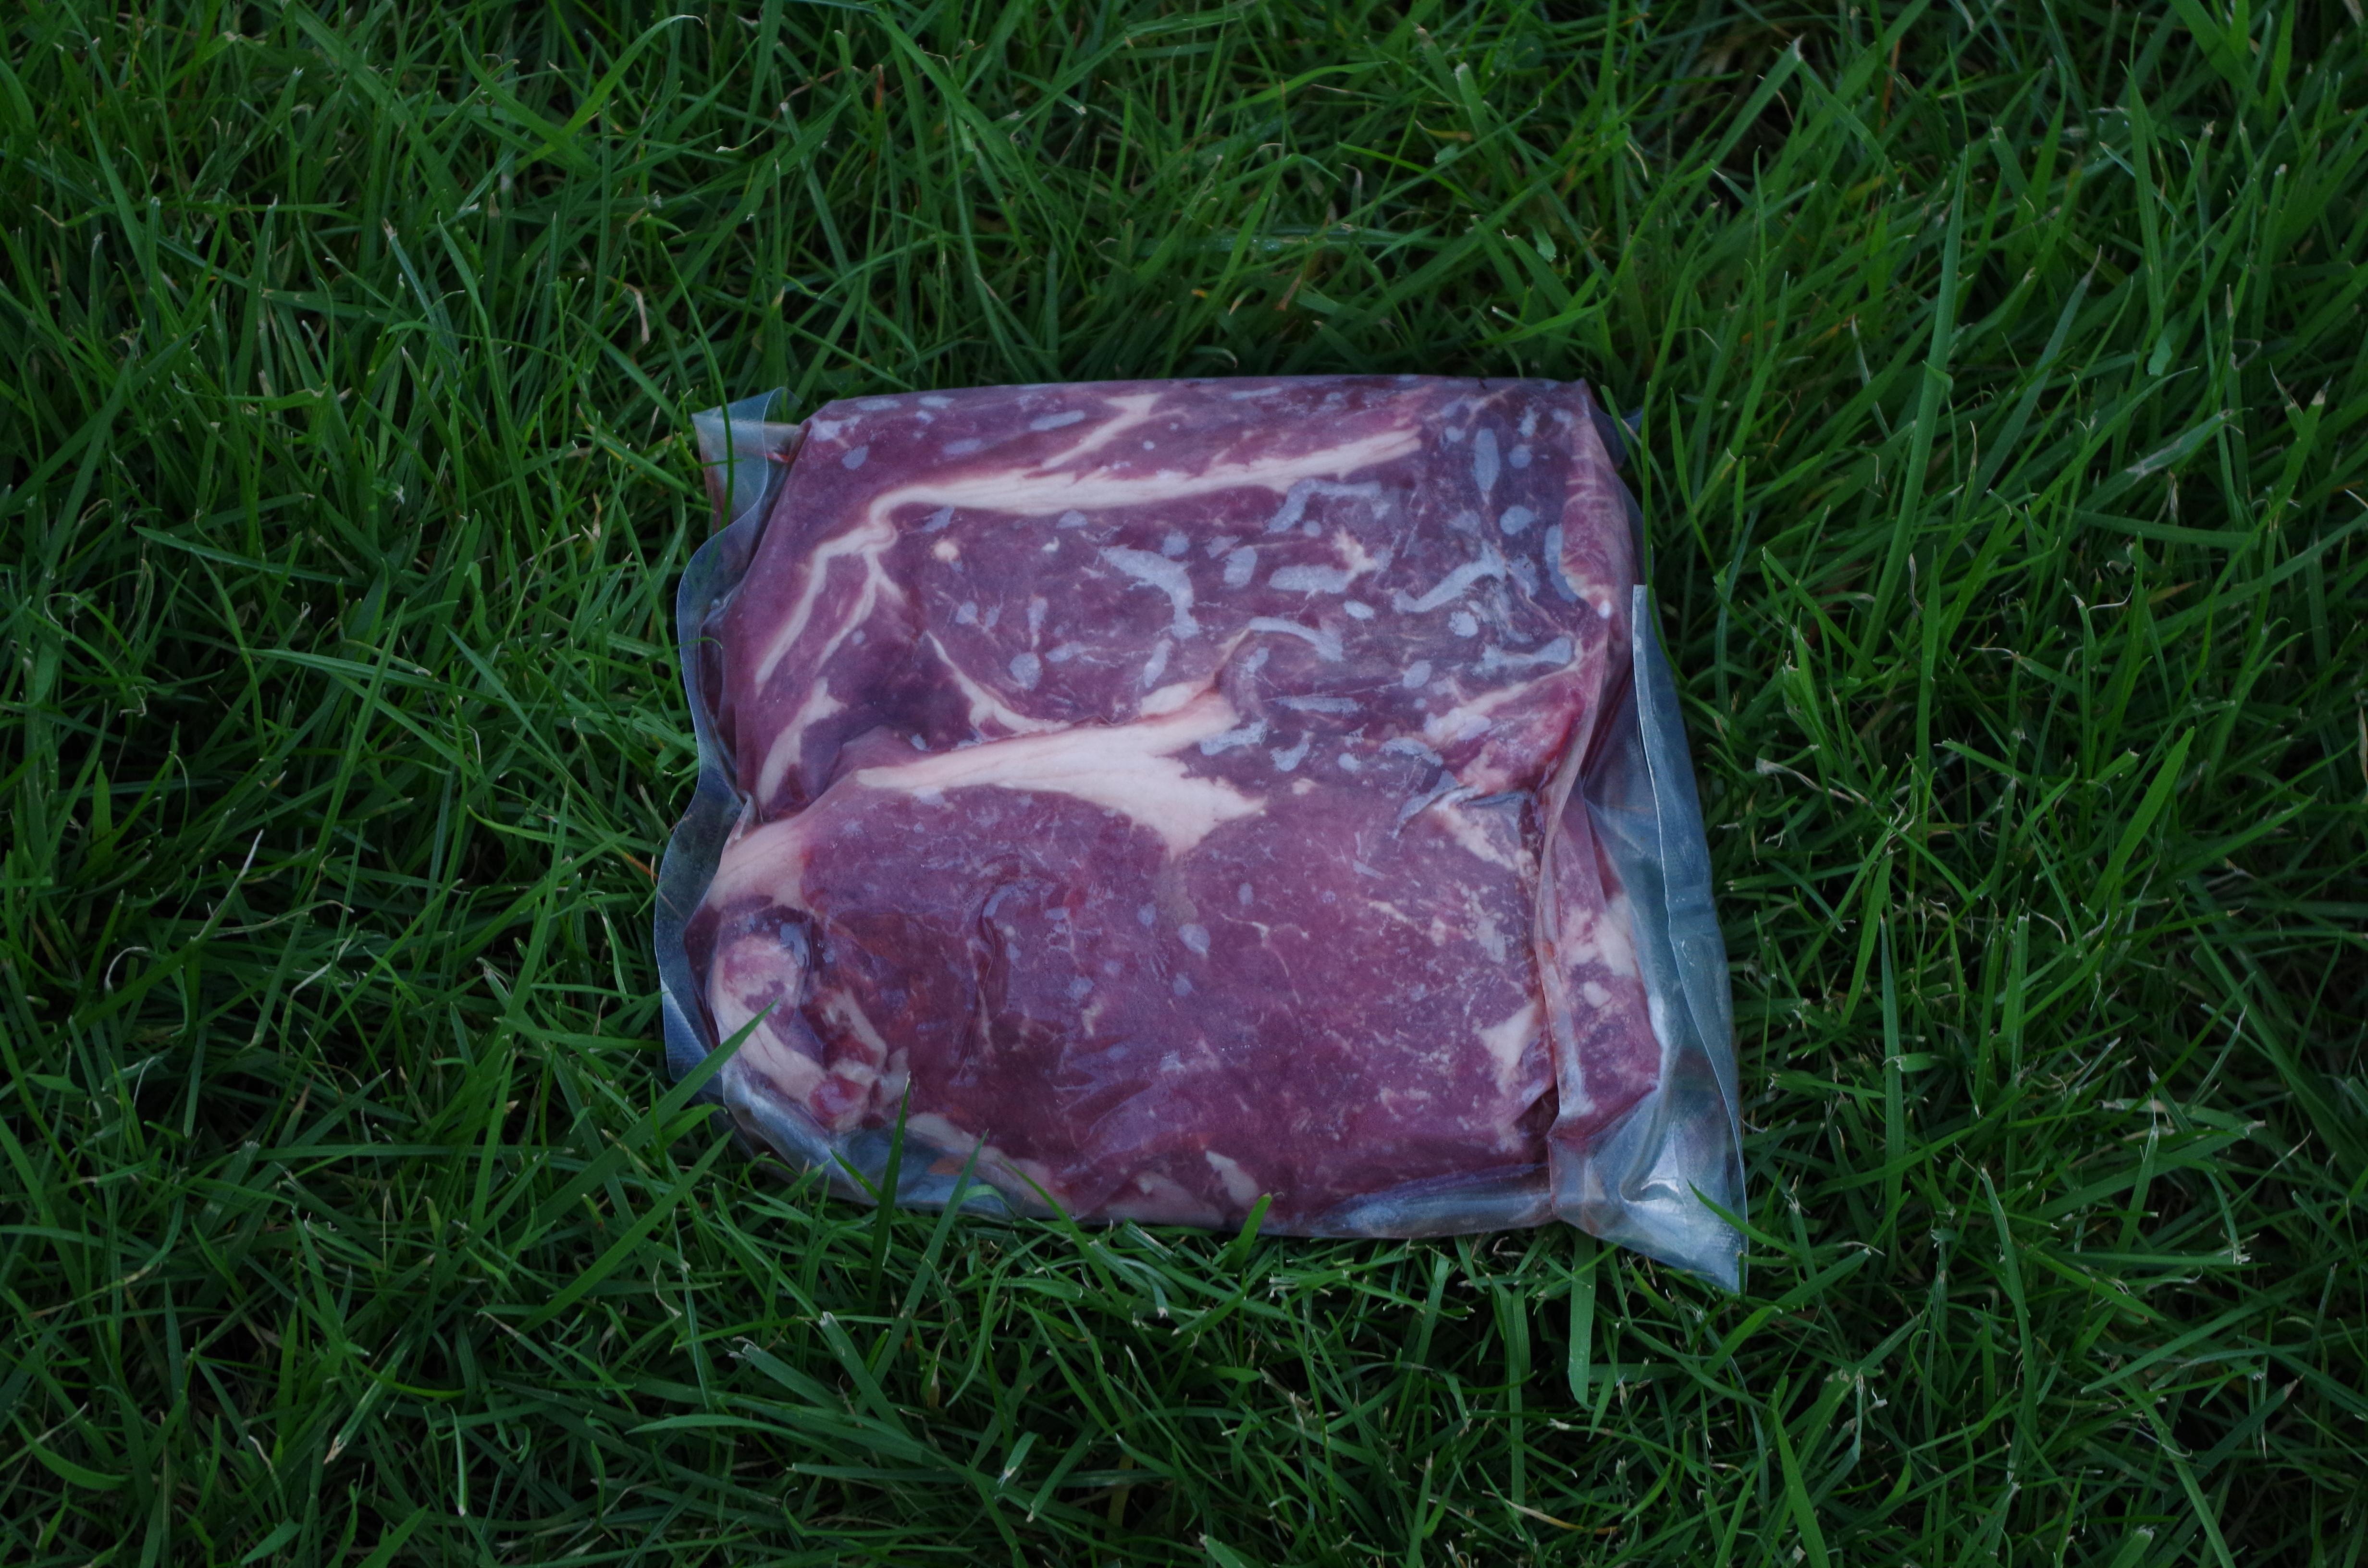 grass fed ribeye steak